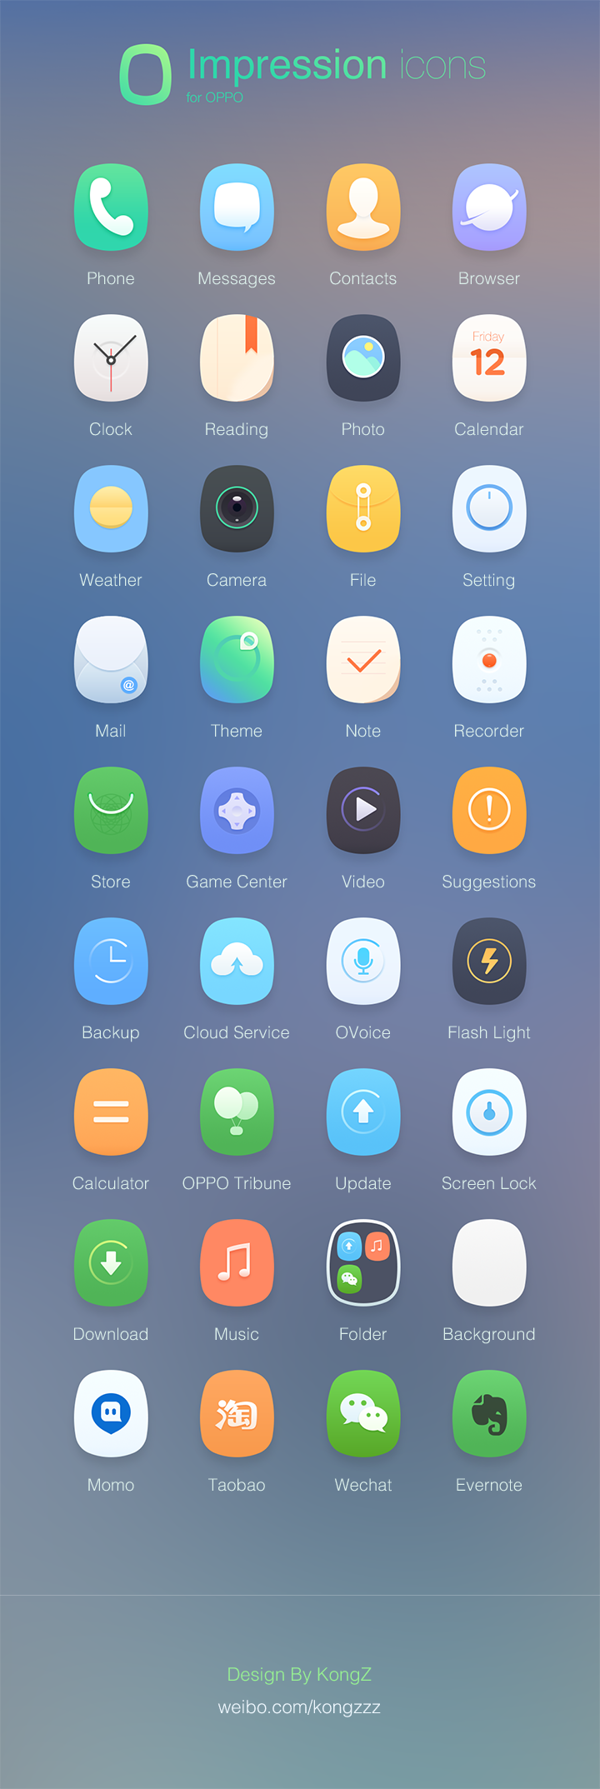 Impression -- theme for OPPO phone on Behance   oppo   App